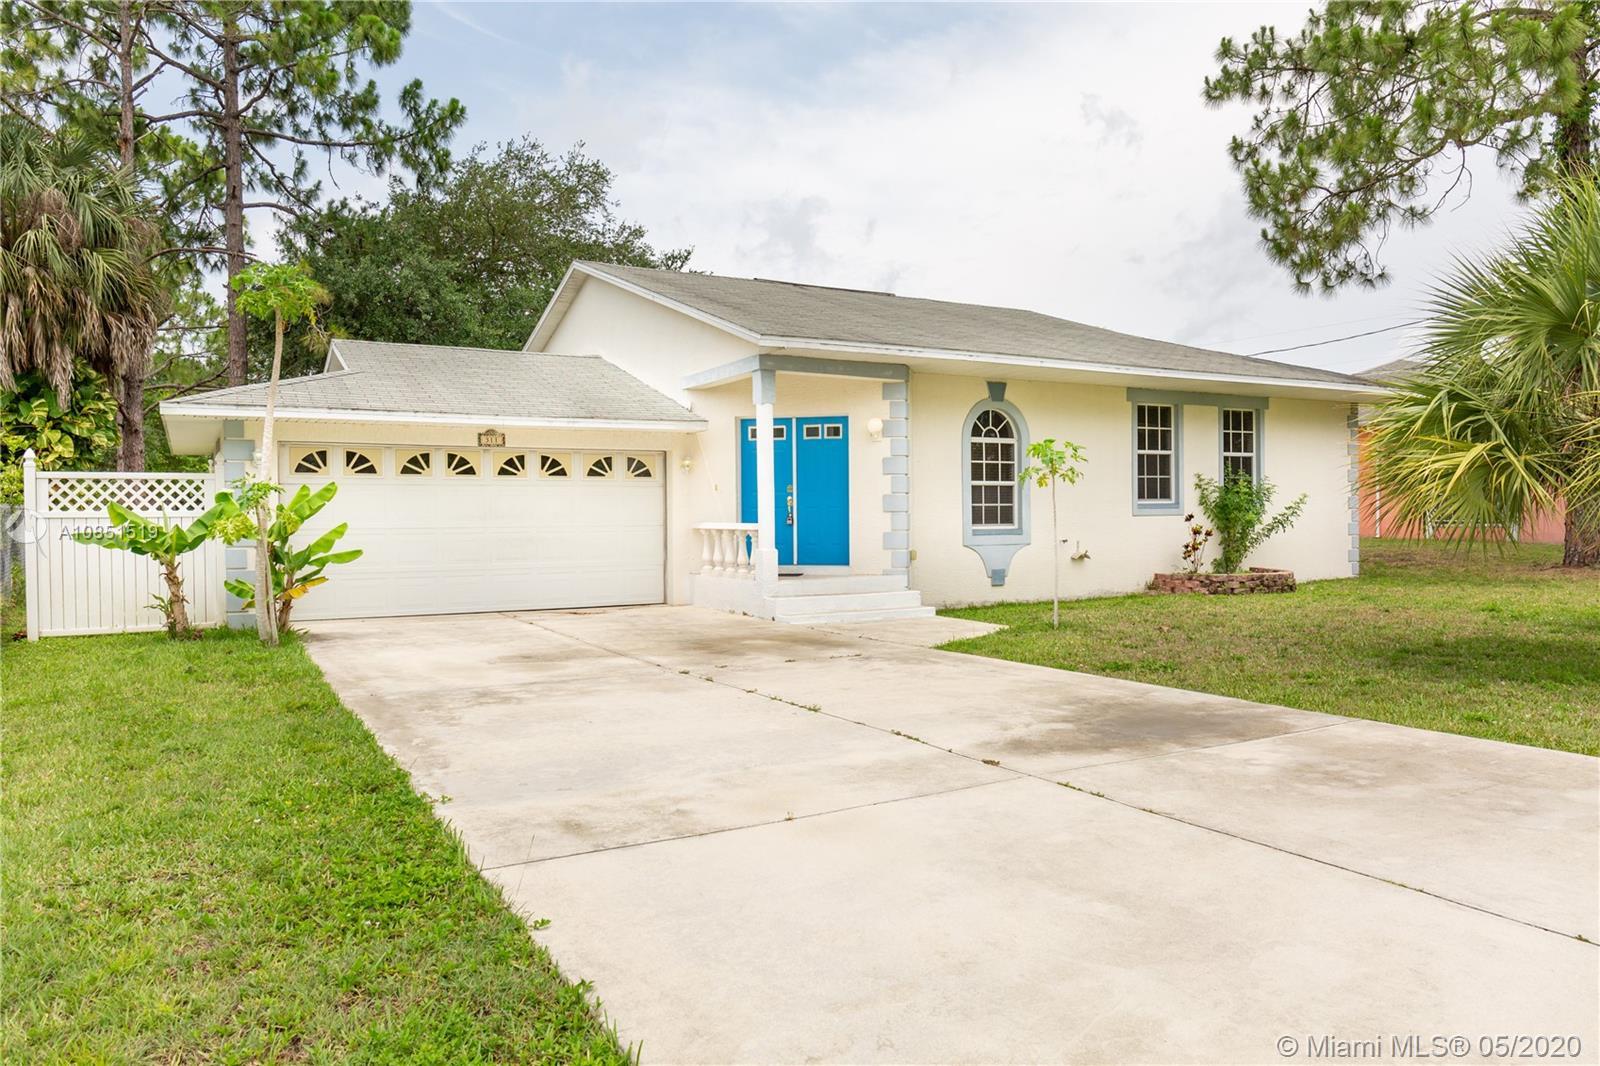 311 CONNECTICUT RD, Lehigh Acres, FL 33936